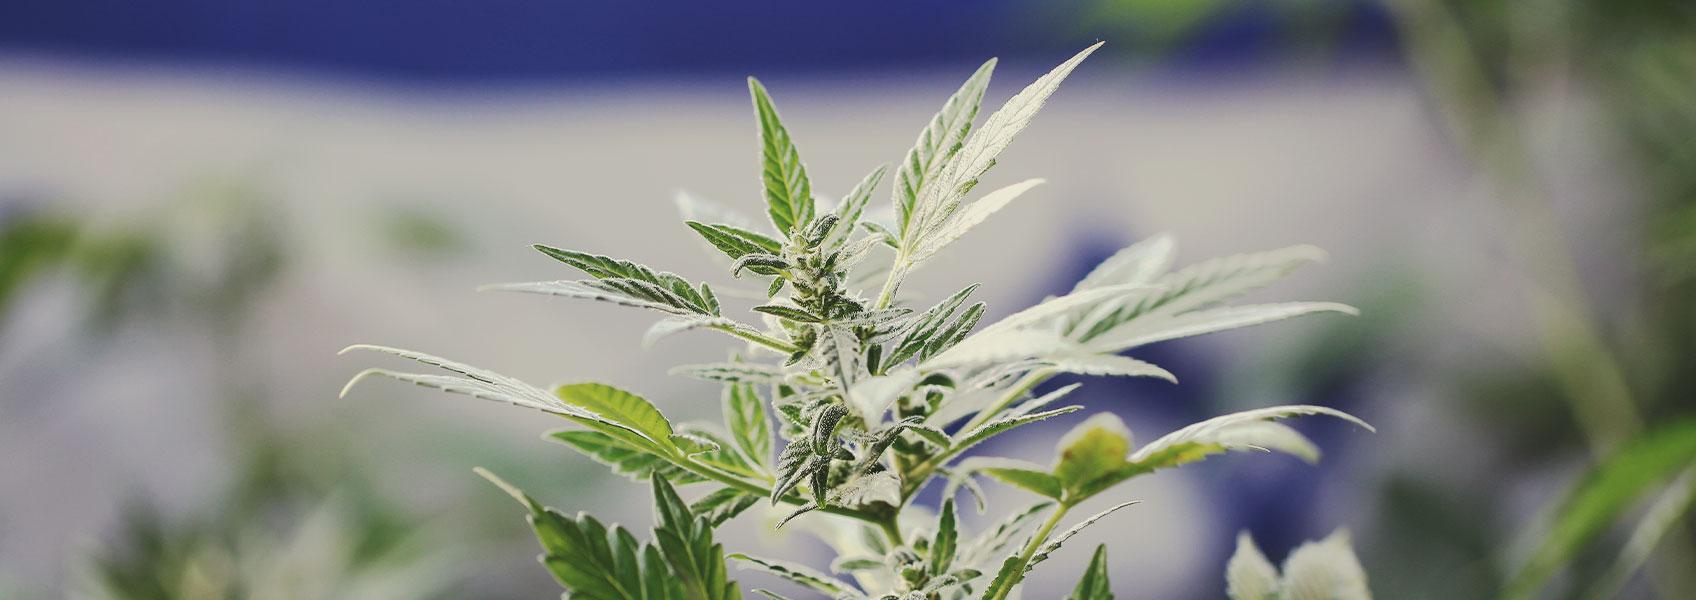 Cannabisforschung in Israel: Ein wegweisendes Modell